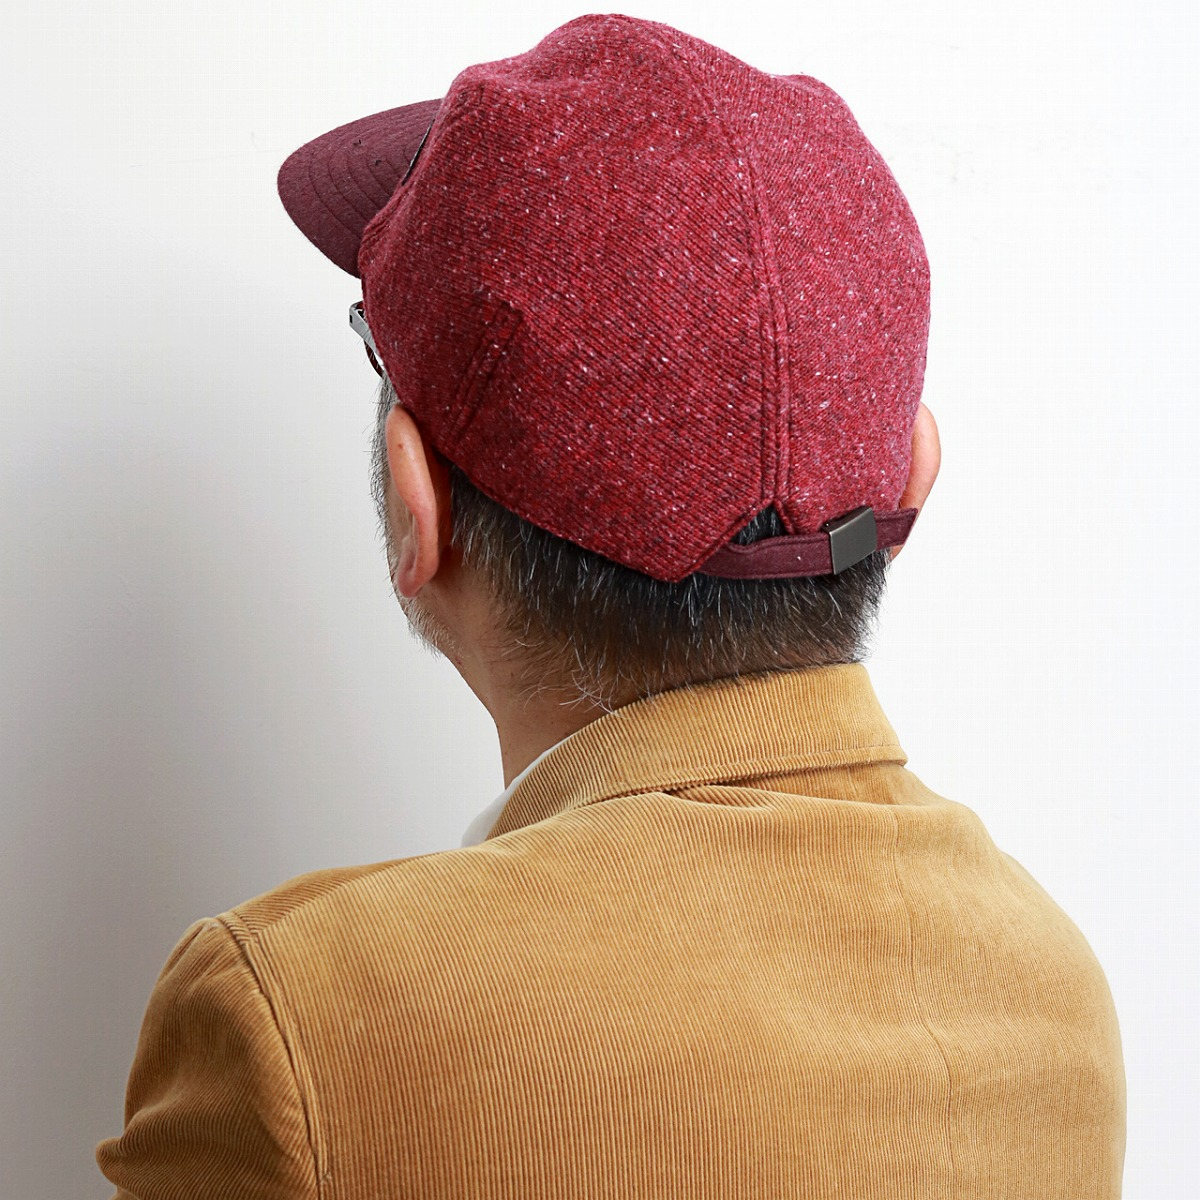 0deca8c2 ... The cap men sicacova hat check Viyella raised NEP knit CAP winter  material logo mark Malin